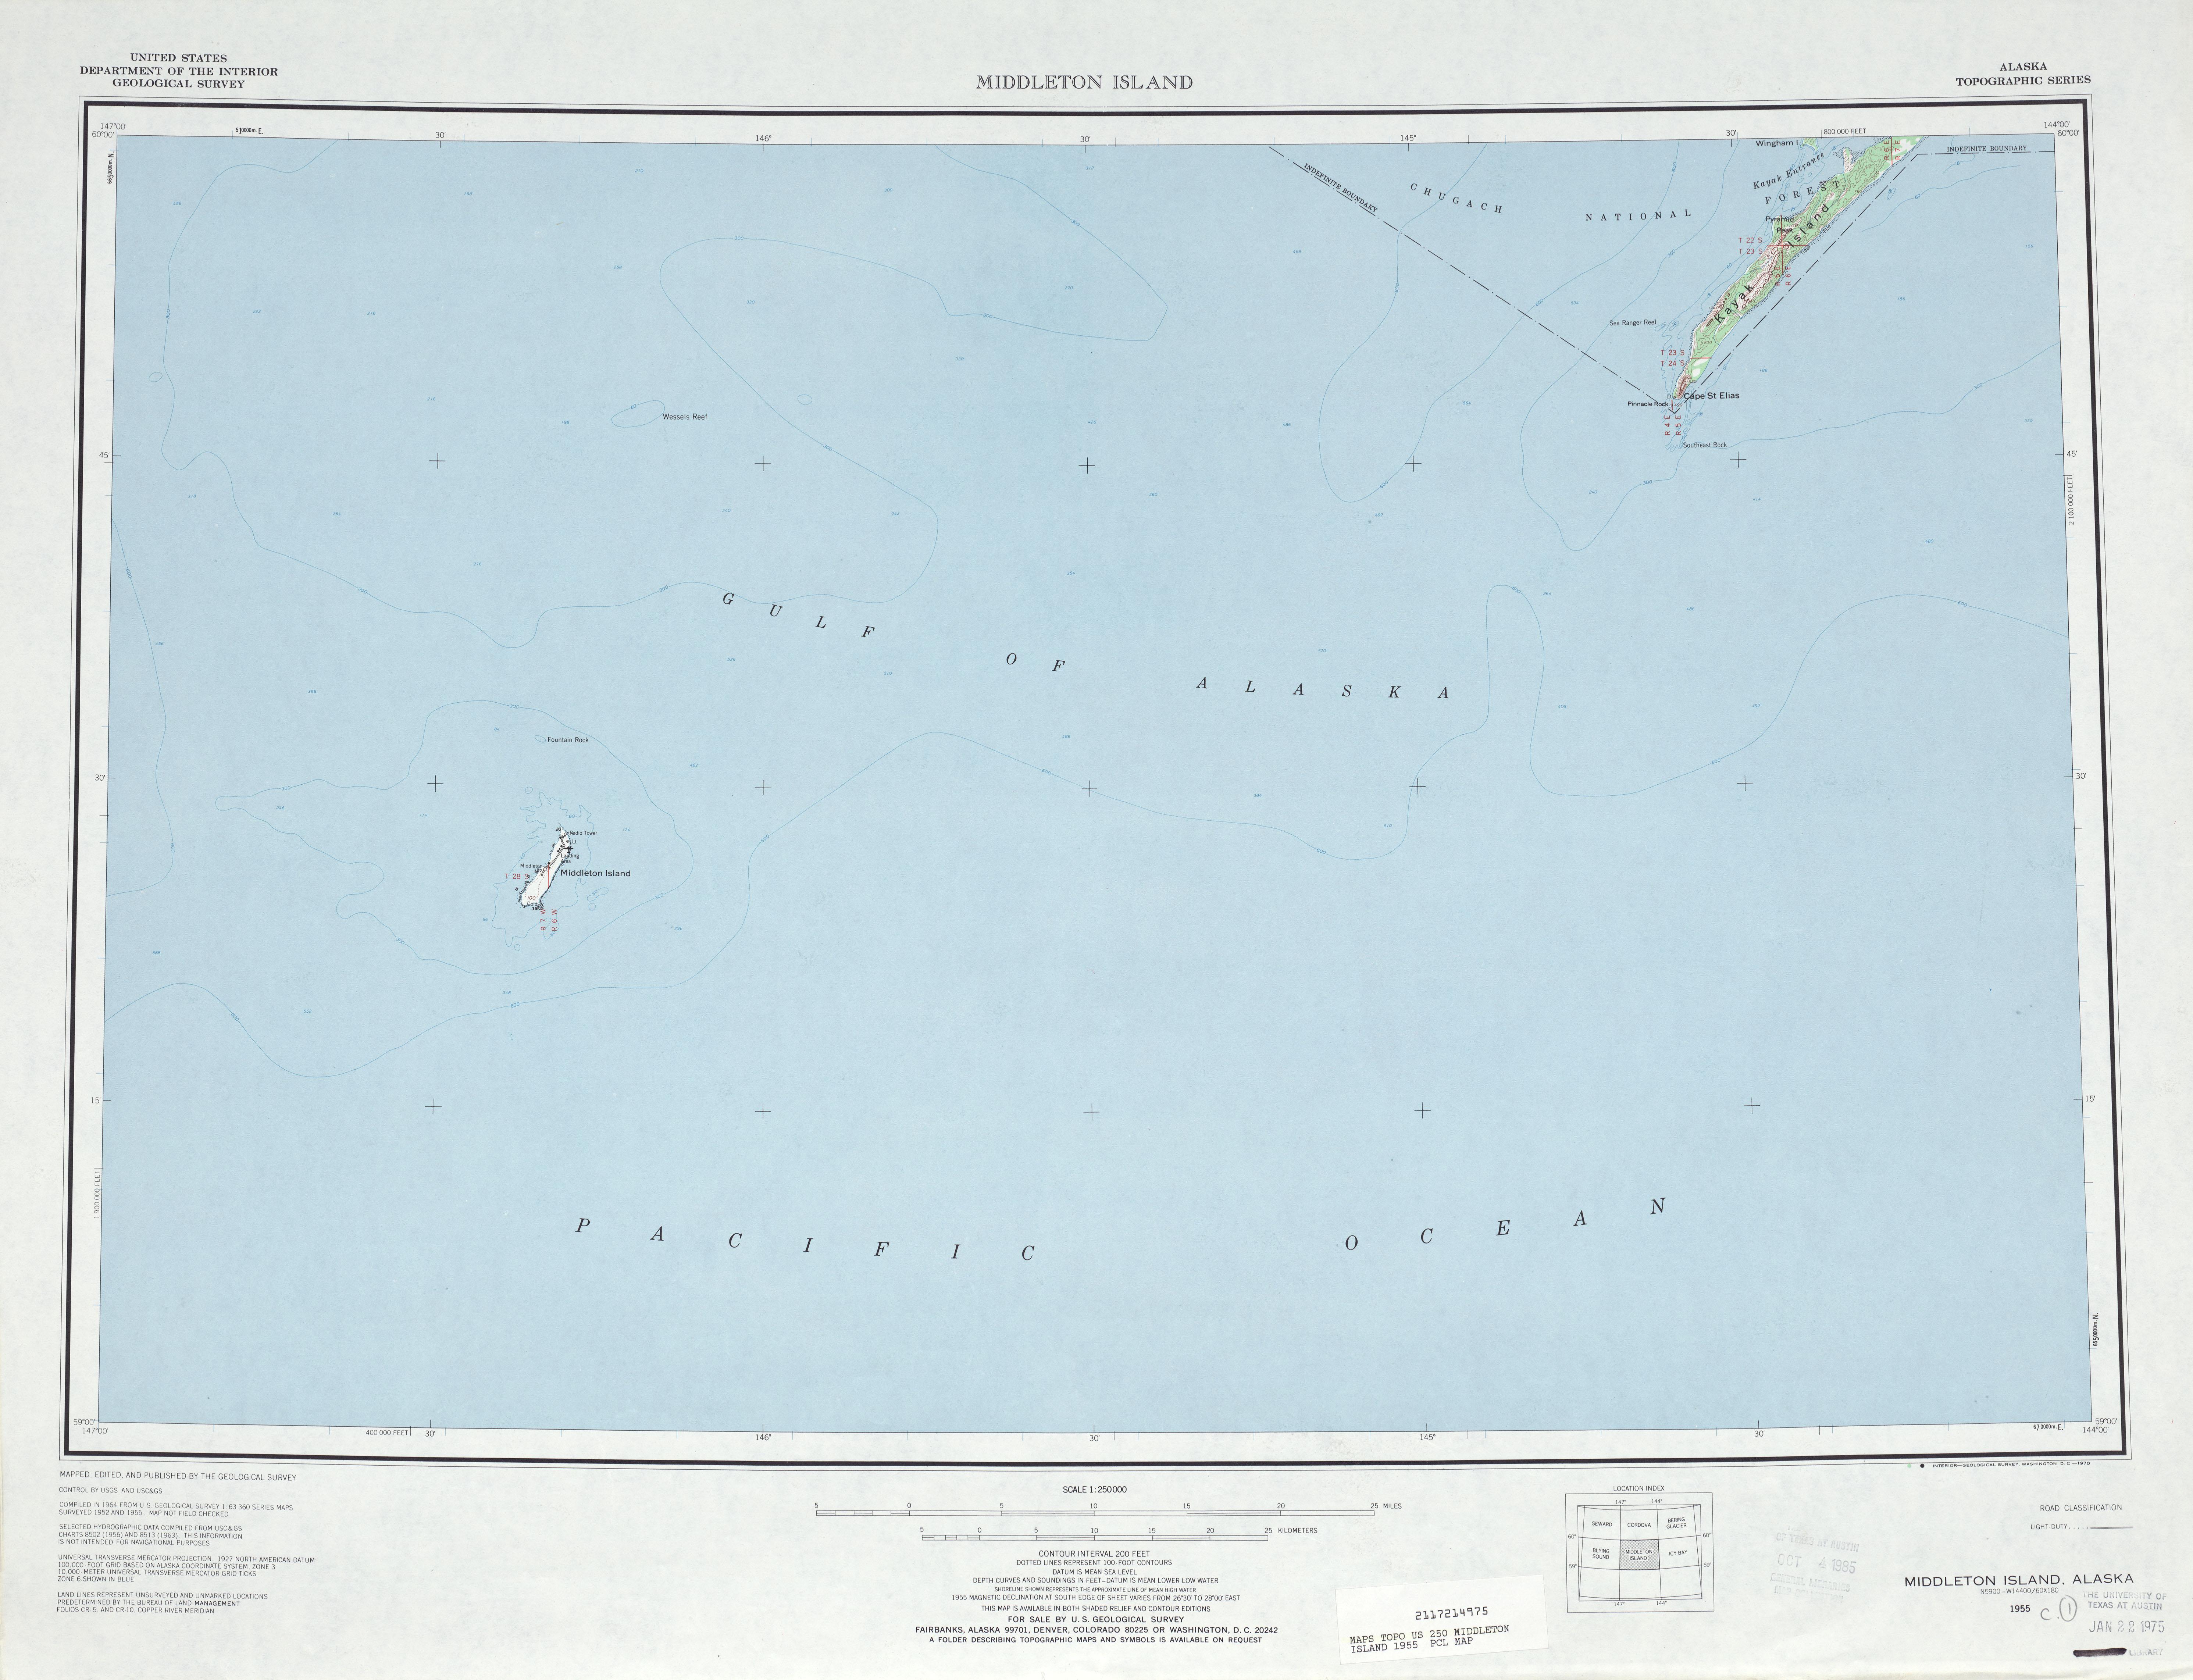 Middleton Island Topographic Map Sheet, United States 1955